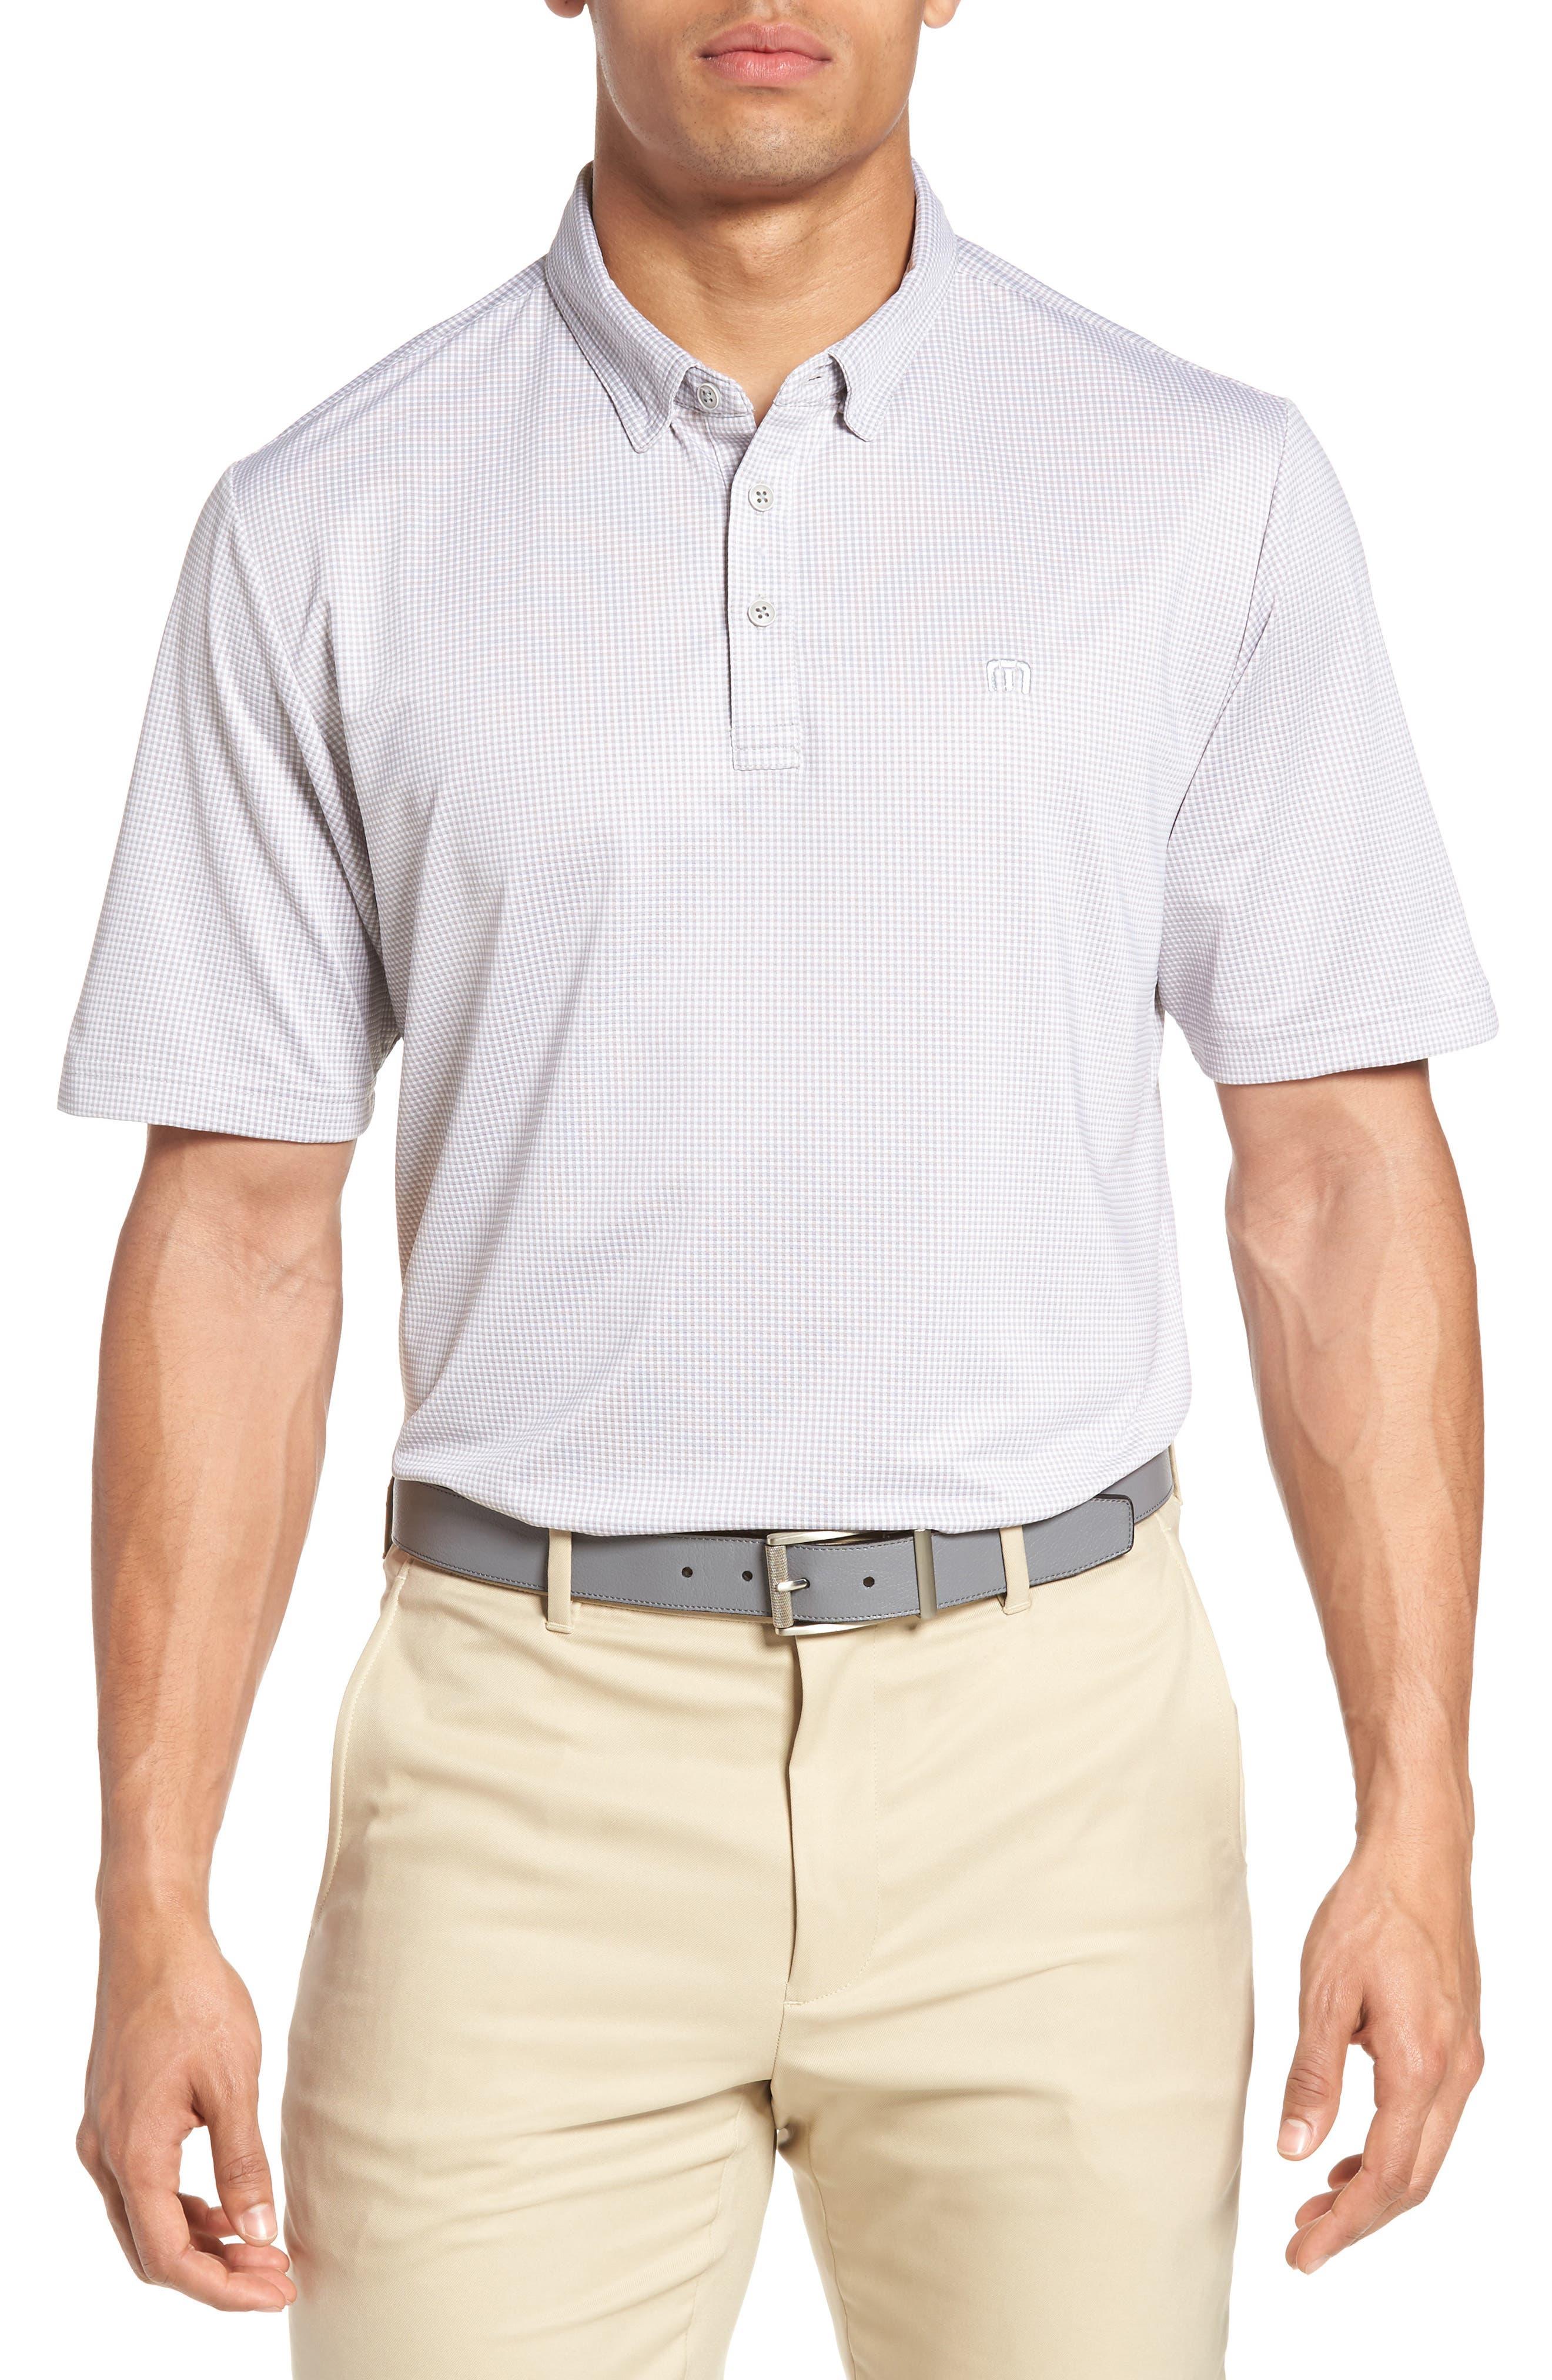 Zim Polo,                         Main,                         color, Alloy/ White